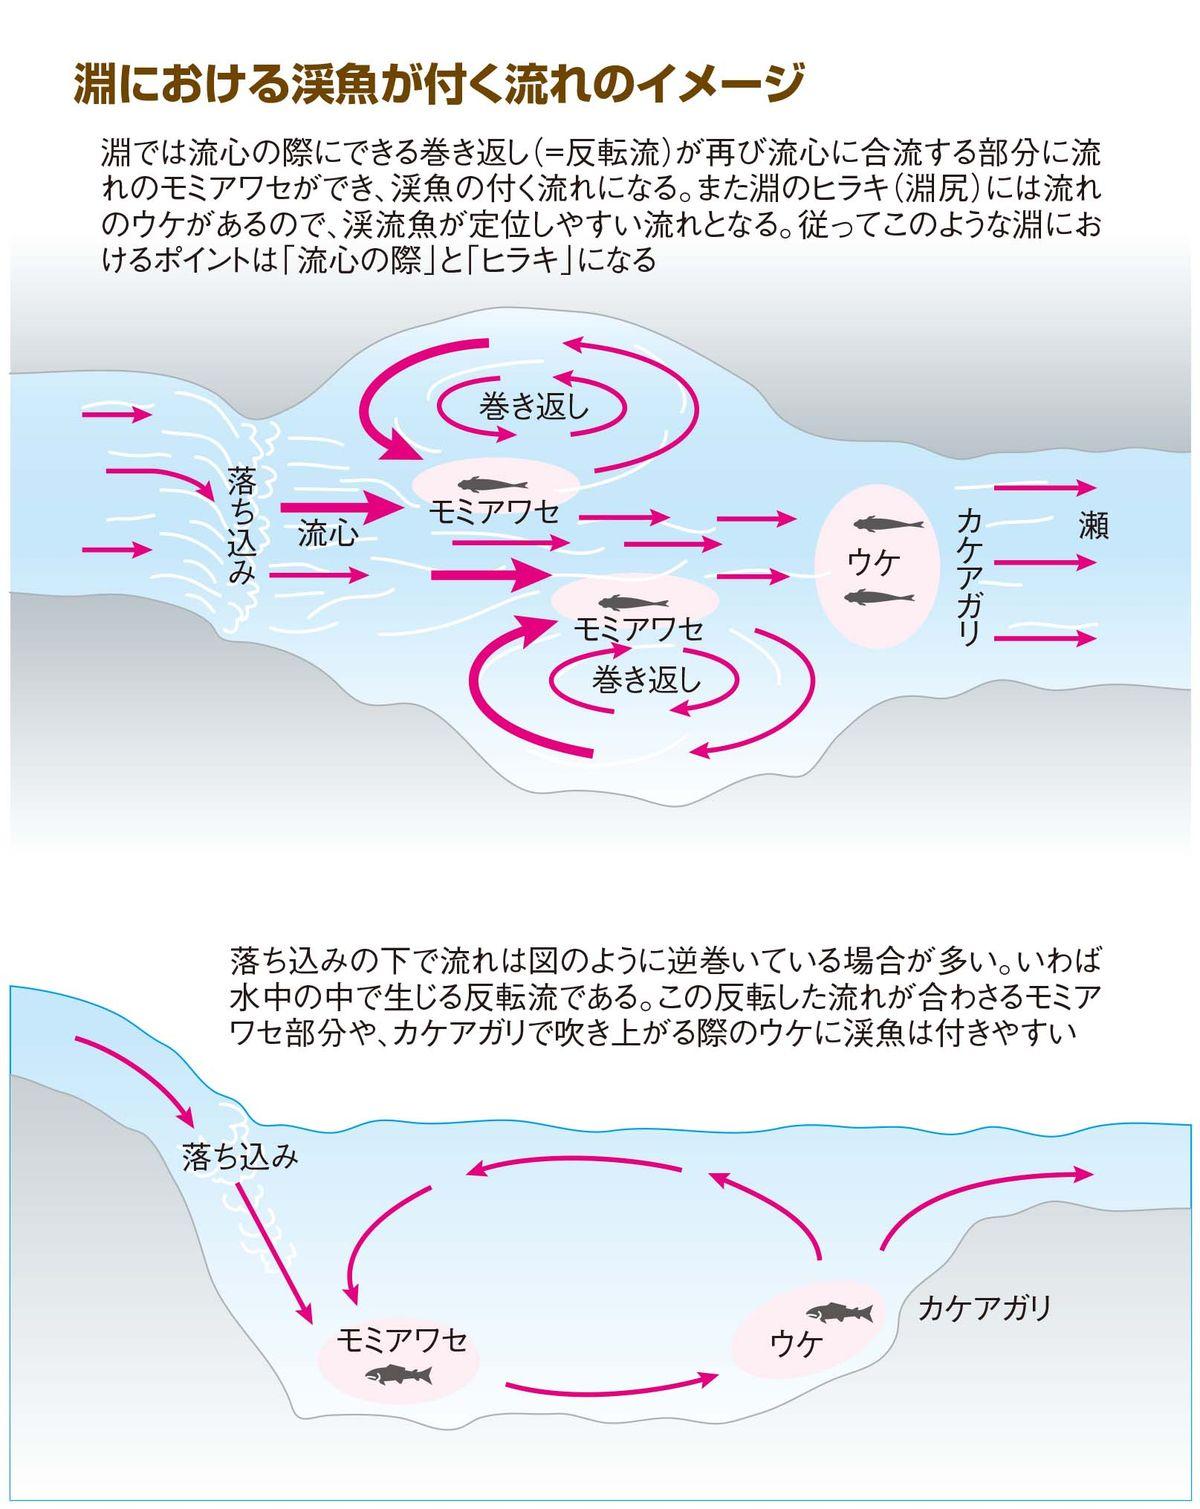 050-055keiryu-nyumon_cs6 (7)